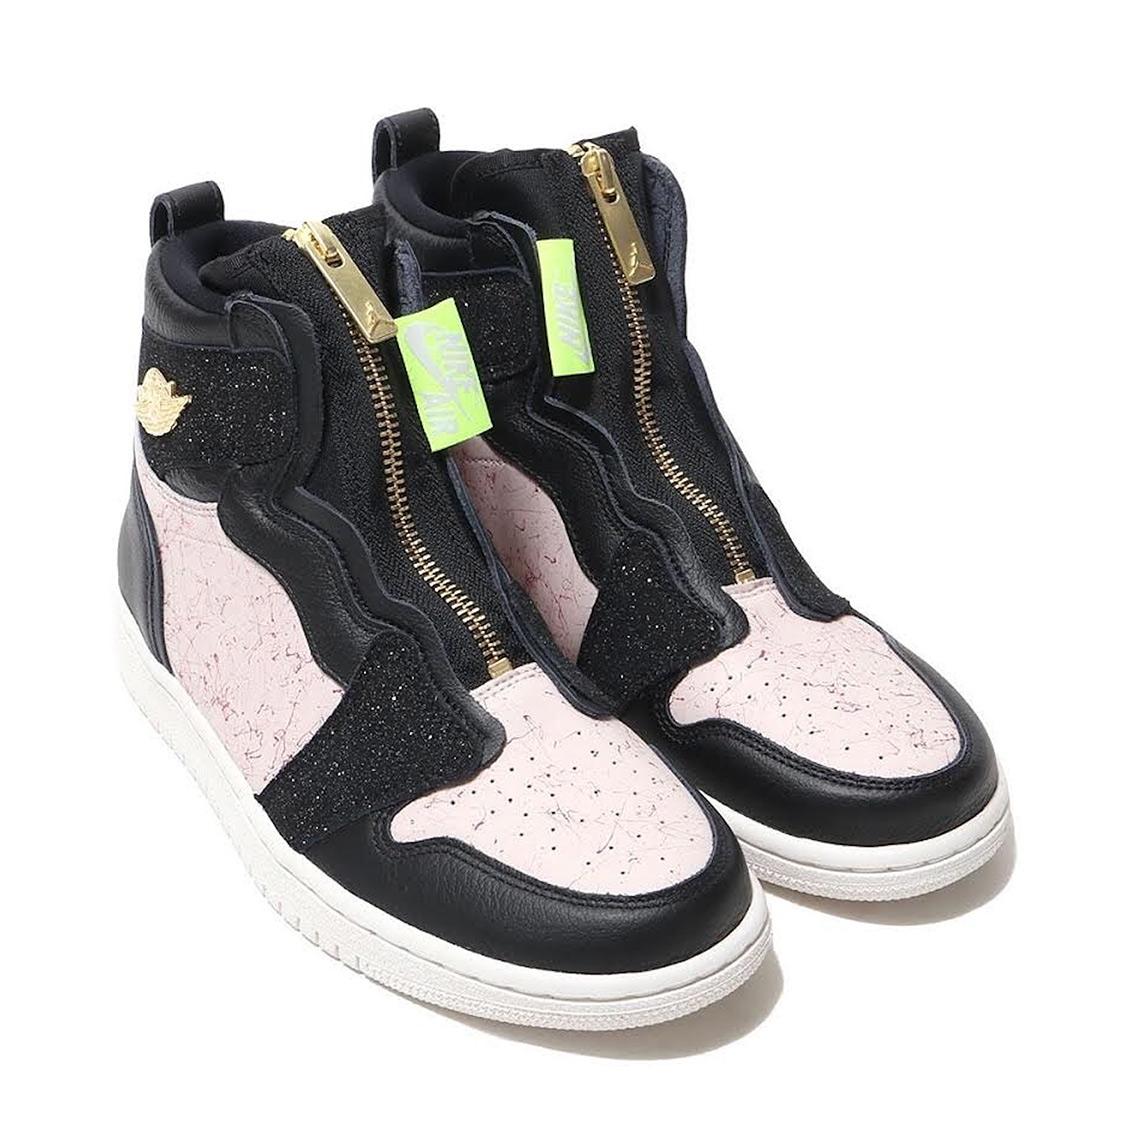 df958b967099d6 Air Jordan 1 Retro High Zip  150. Style Code  AQ3742-001